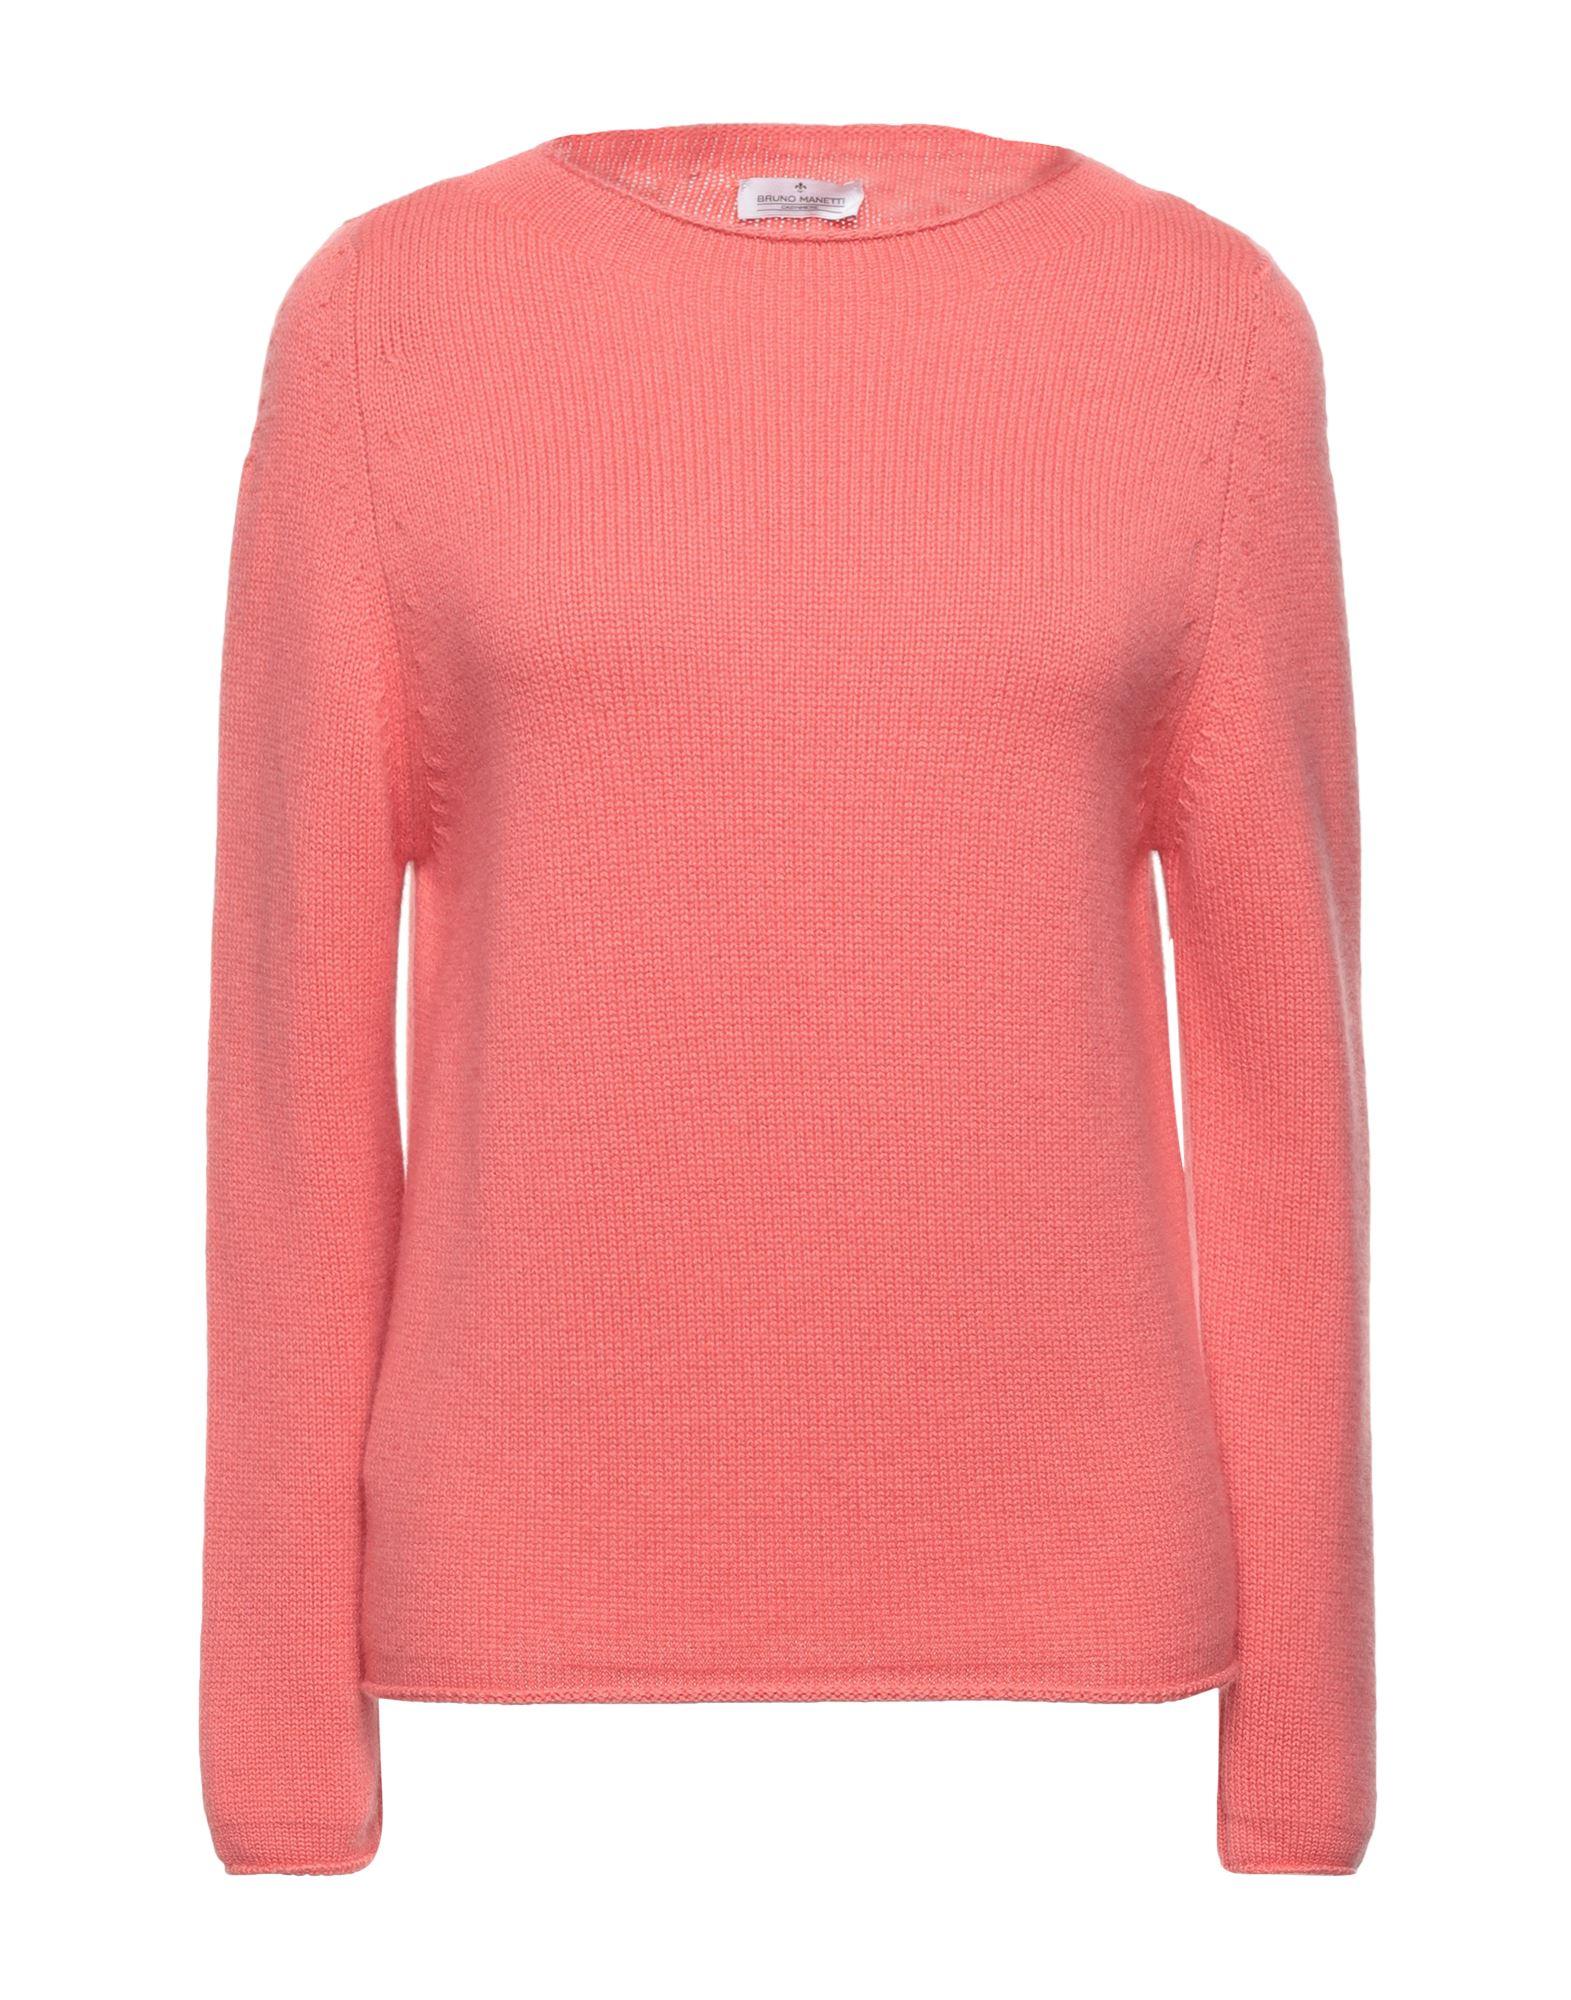 BRUNO MANETTI Sweaters - Item 14142911